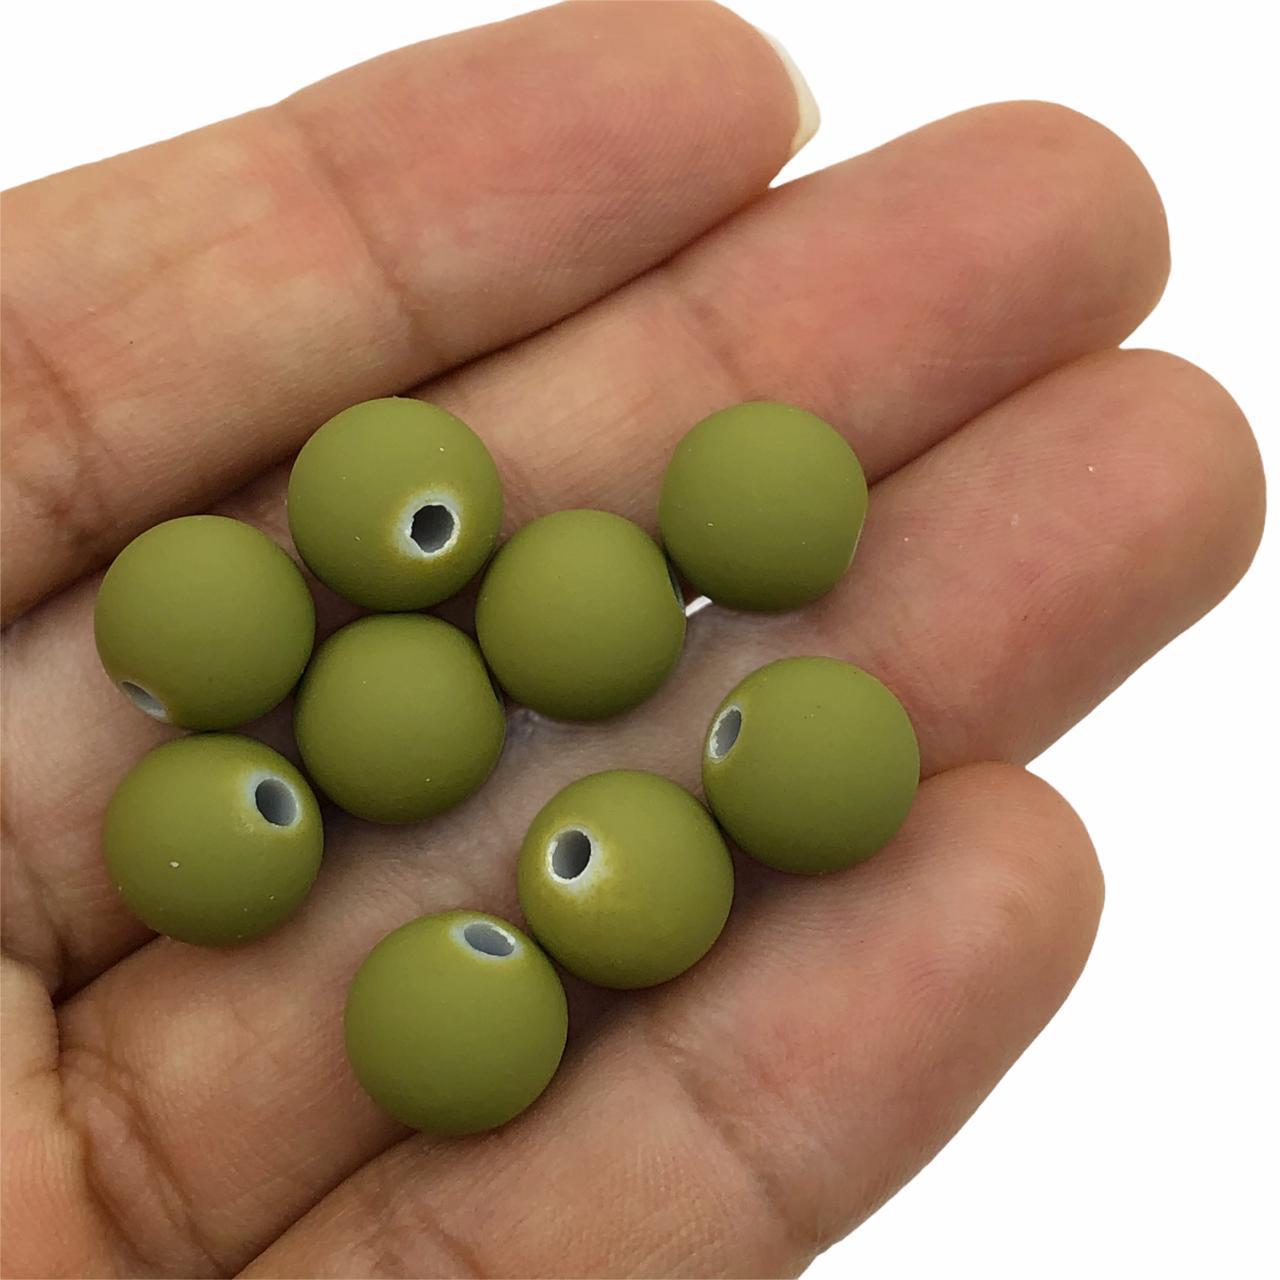 BOL615 - Bola Emborrachada Verde Militar 10mm - 20Grs